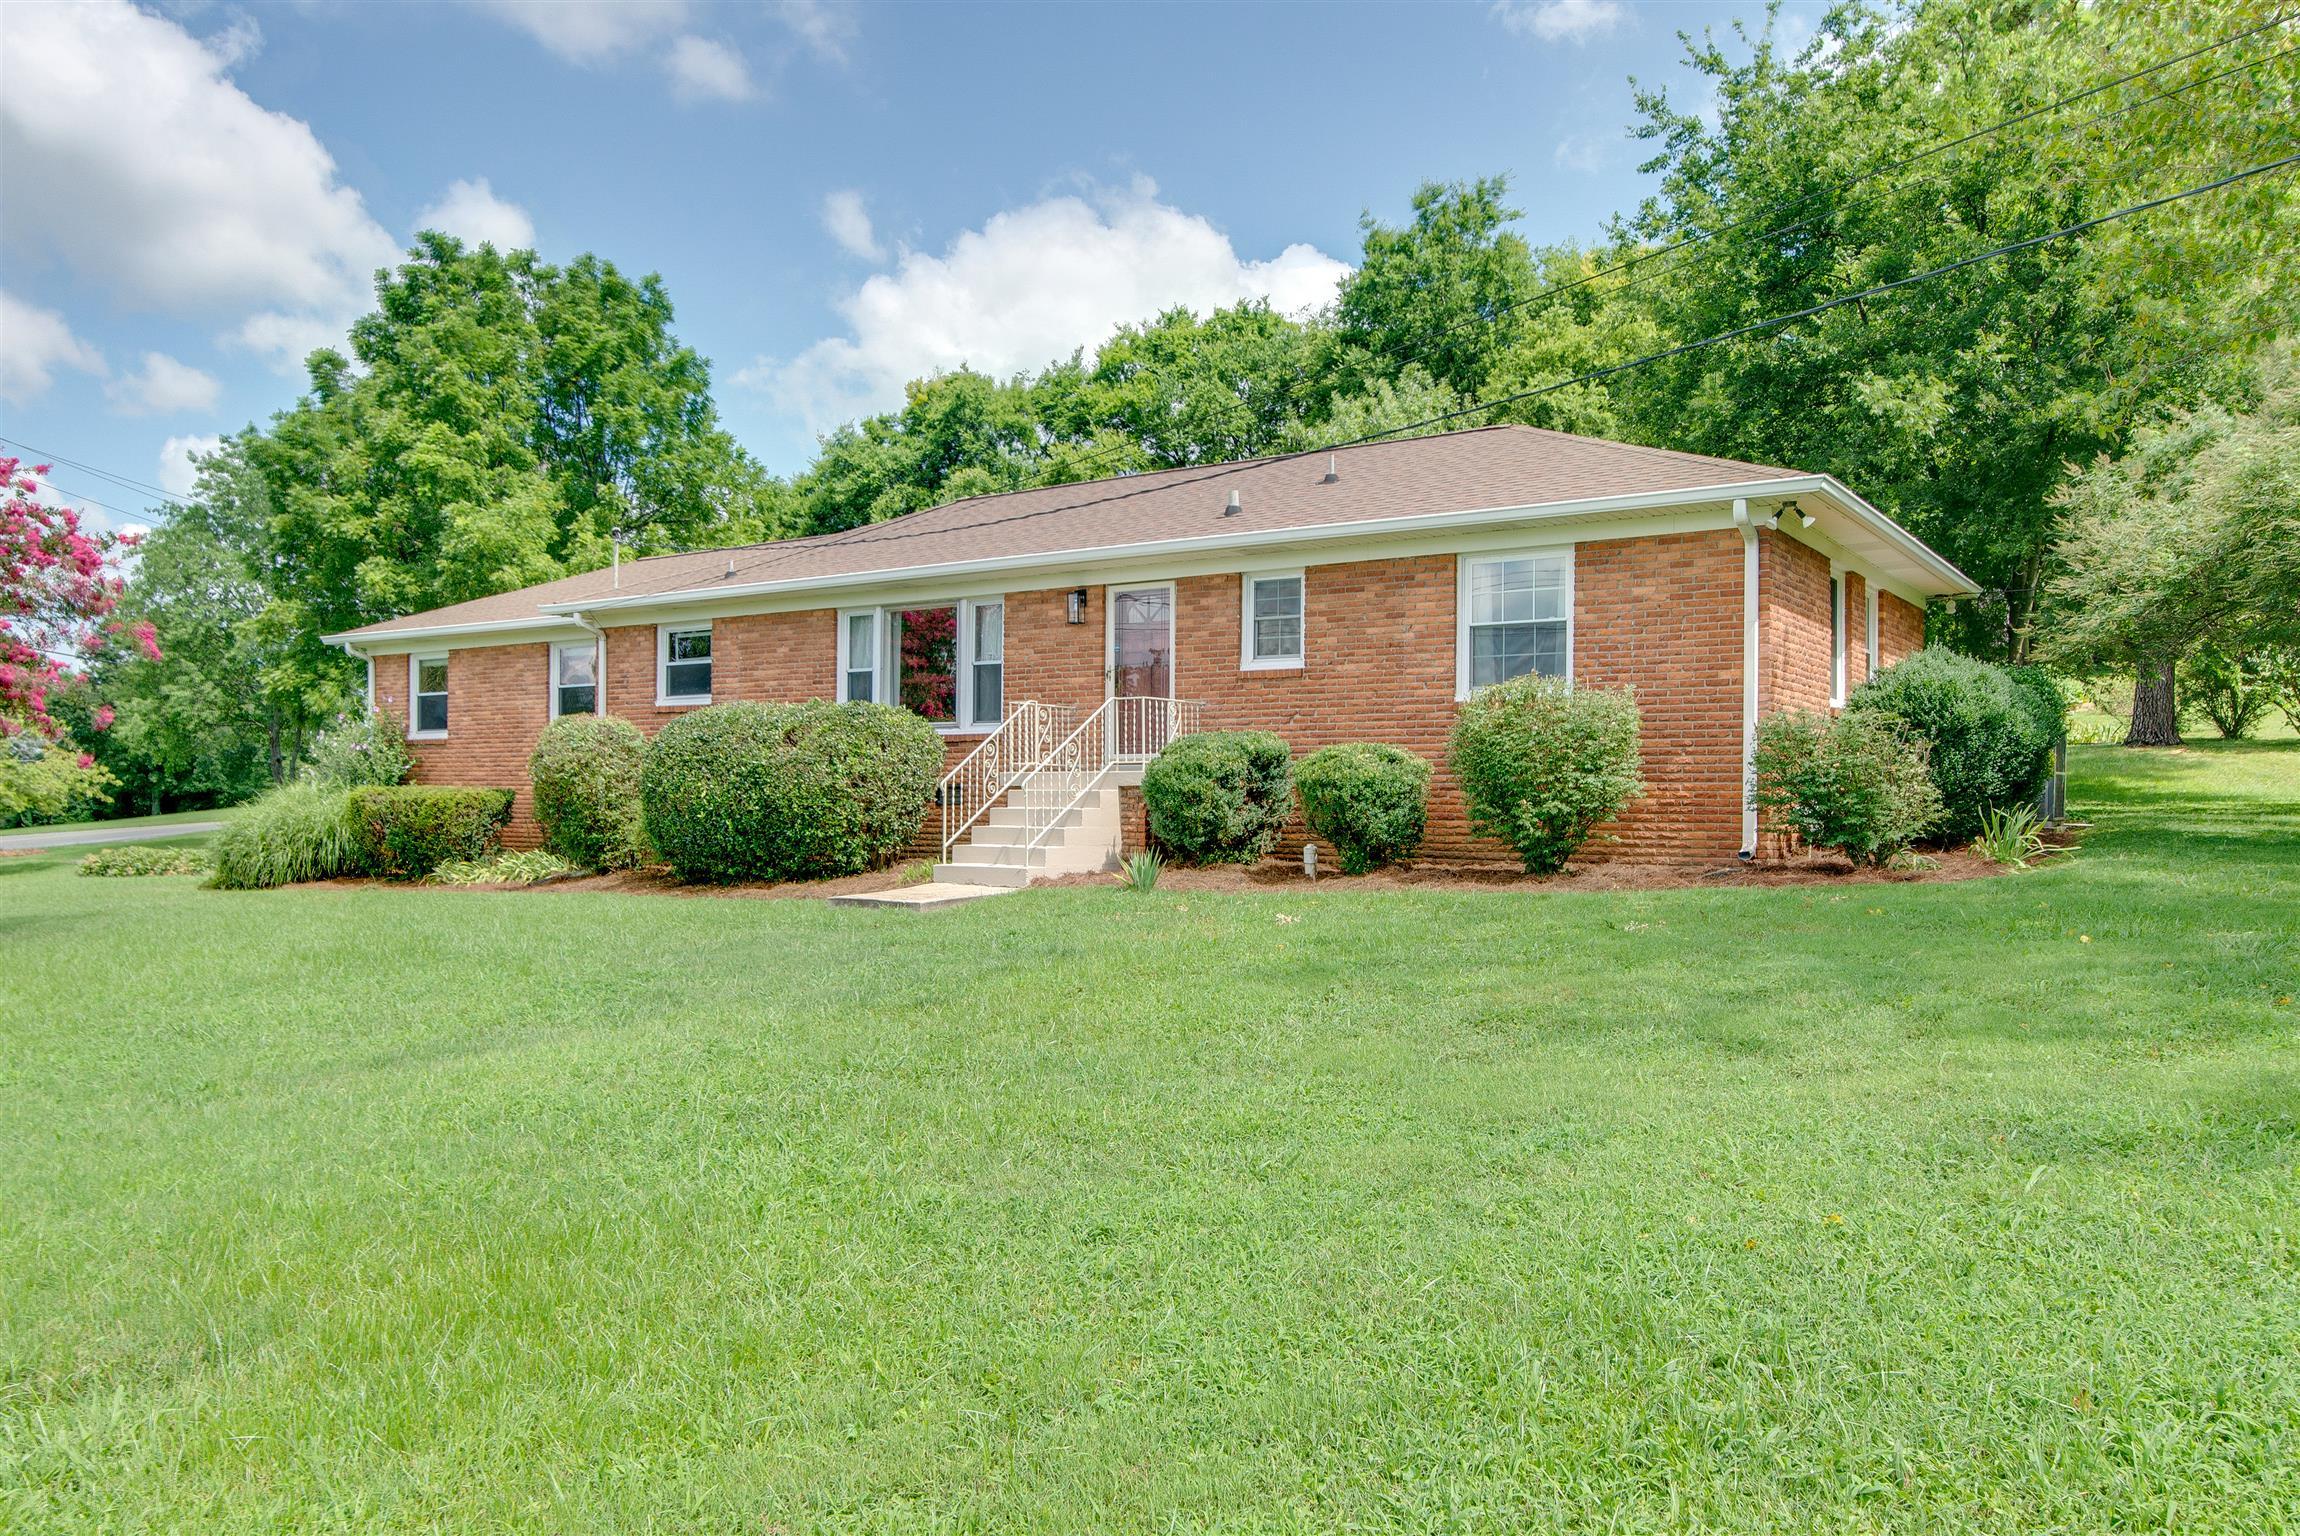 2805 McGavock Pike, Nashville, TN 37214 - Nashville, TN real estate listing